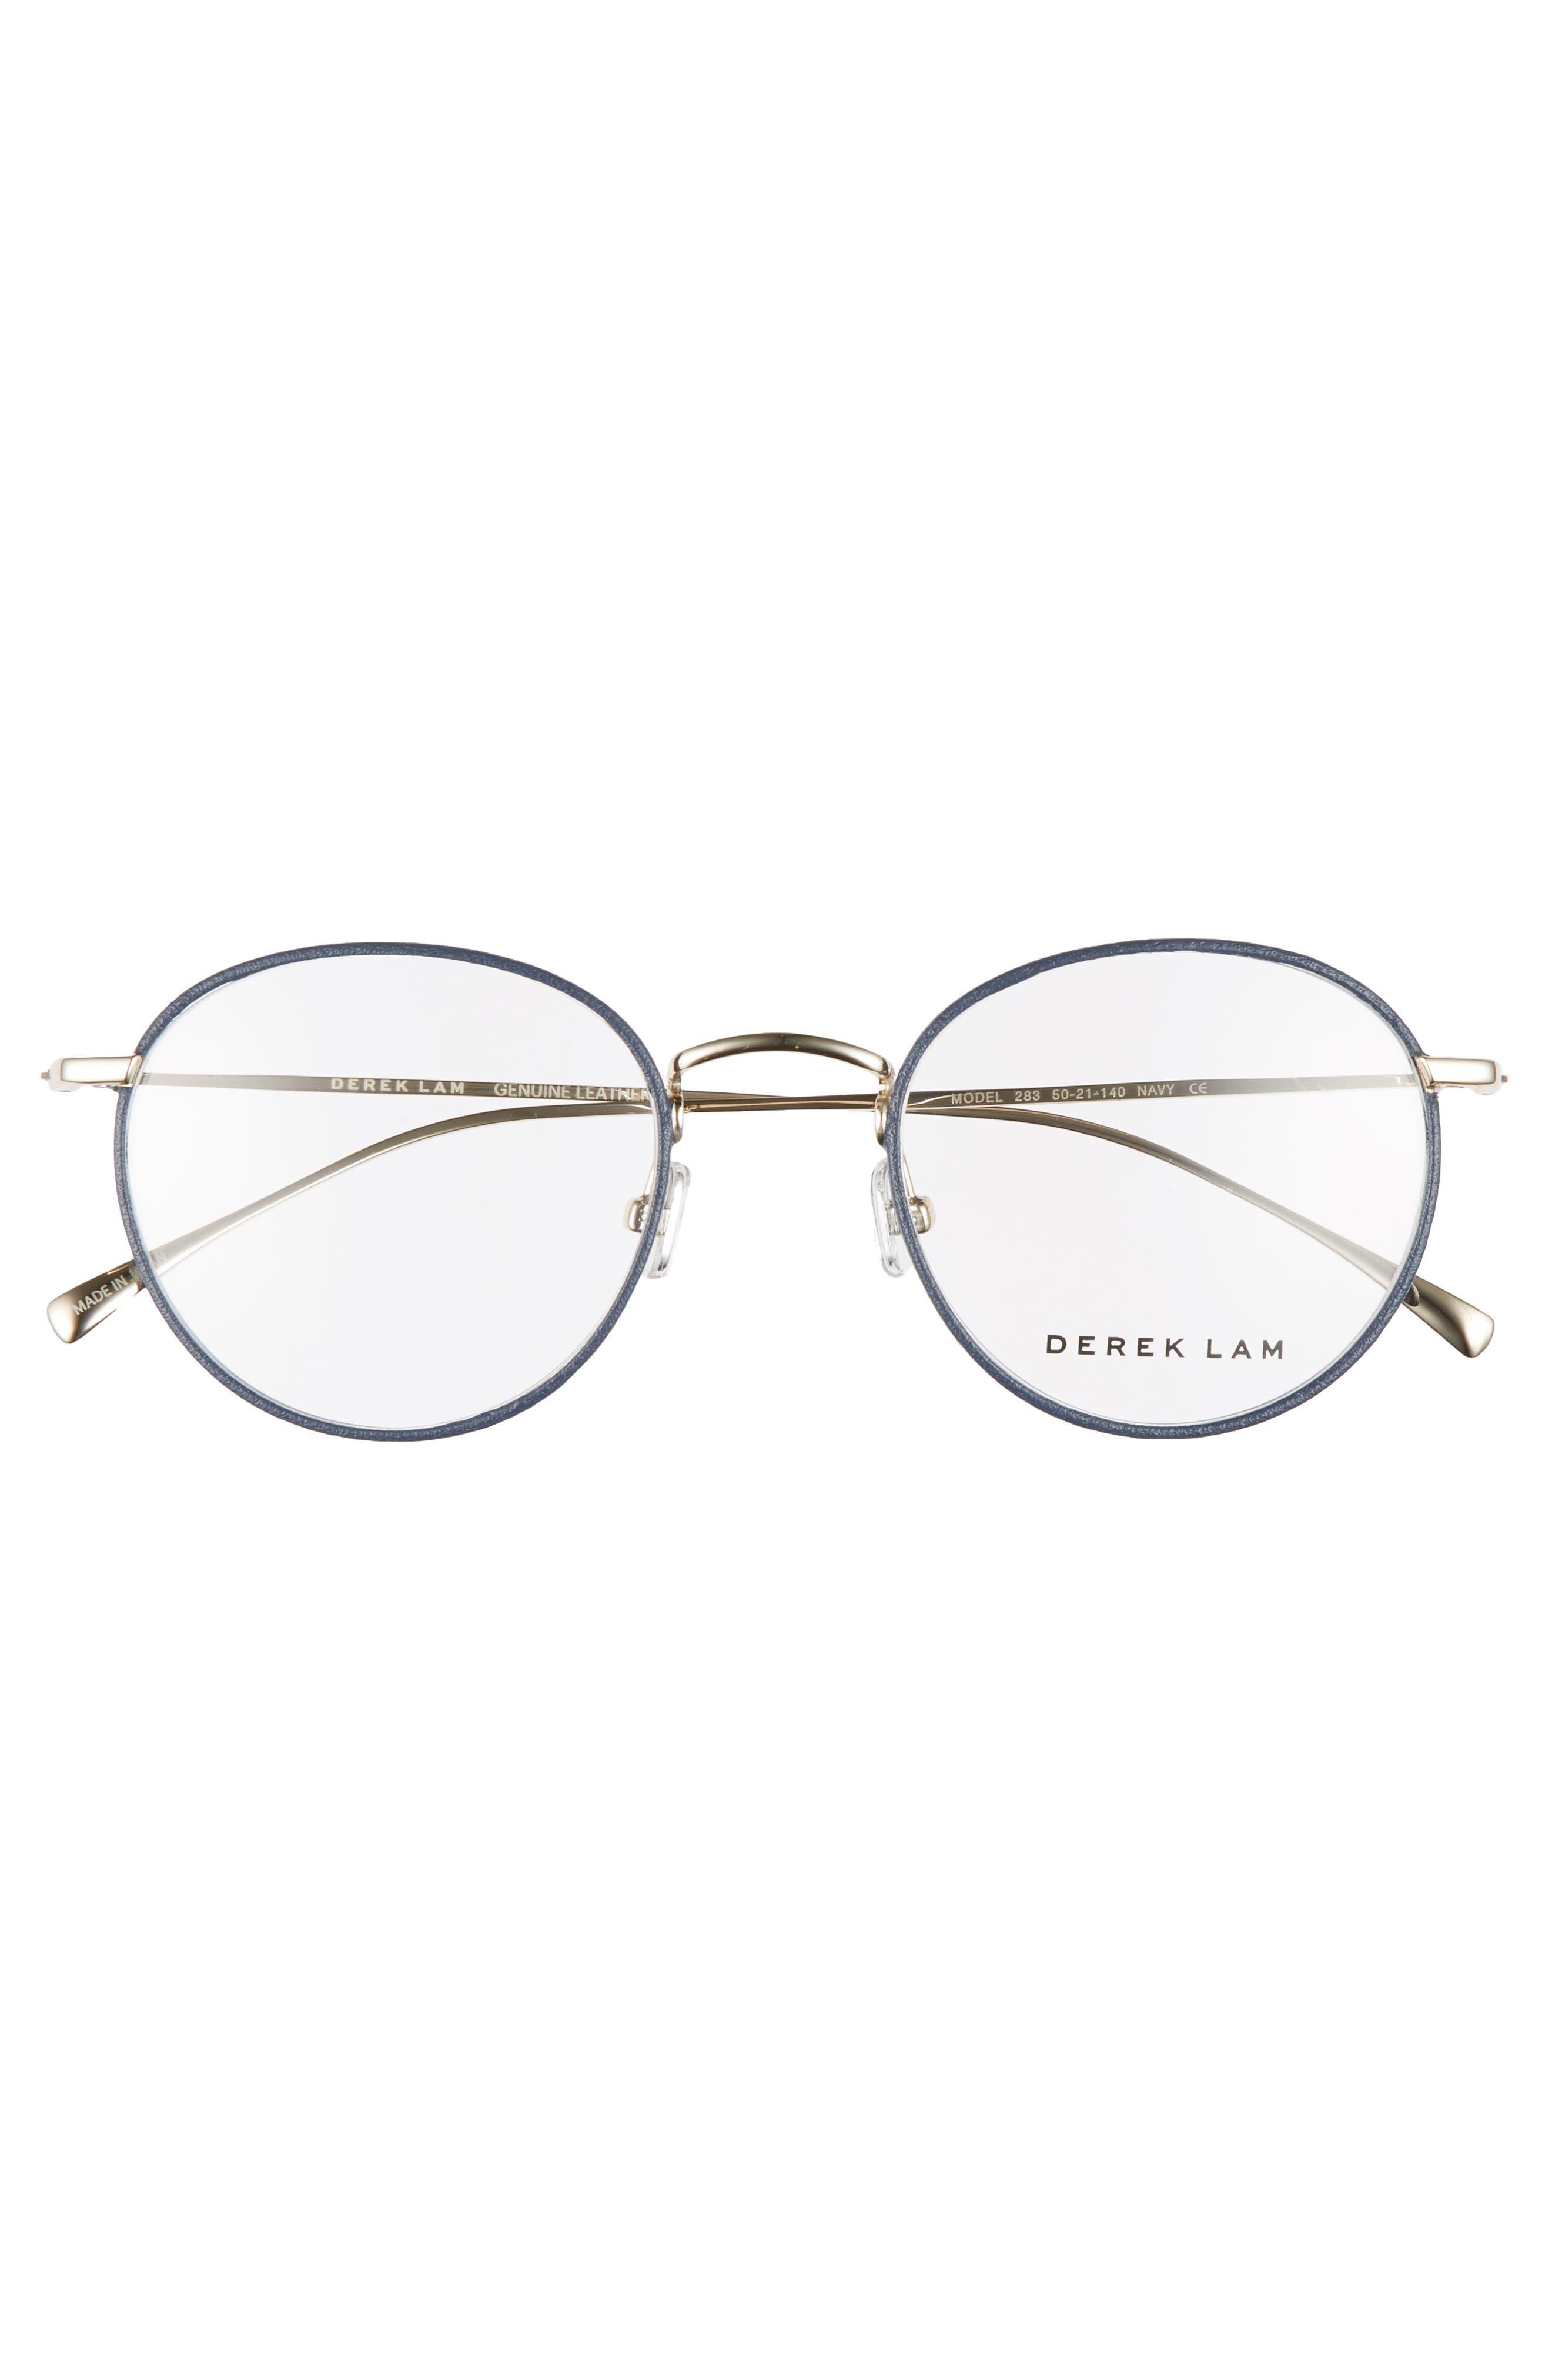 50mm Optical Glasses,                             Alternate thumbnail 2, color,                             Navy